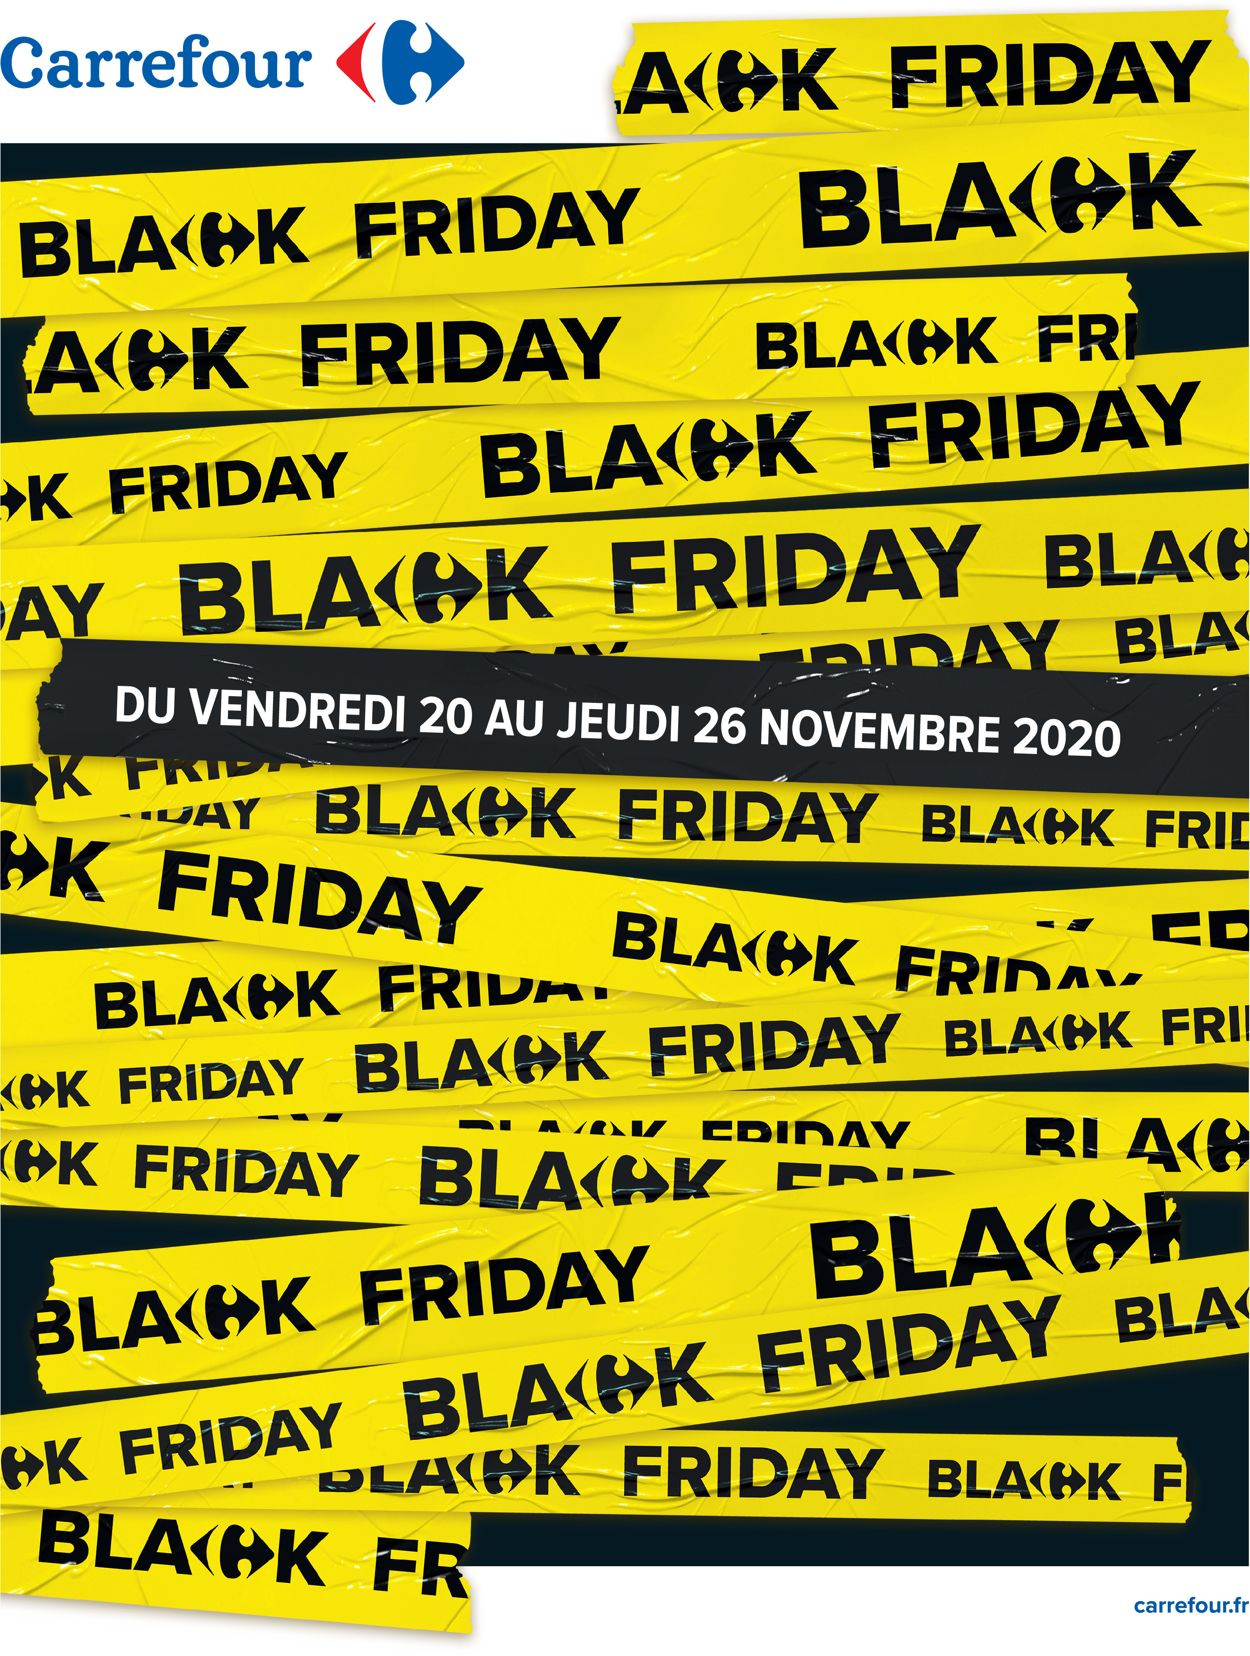 Carrefour Black Friday 2020 Catalogue - 20.11-30.11.2020